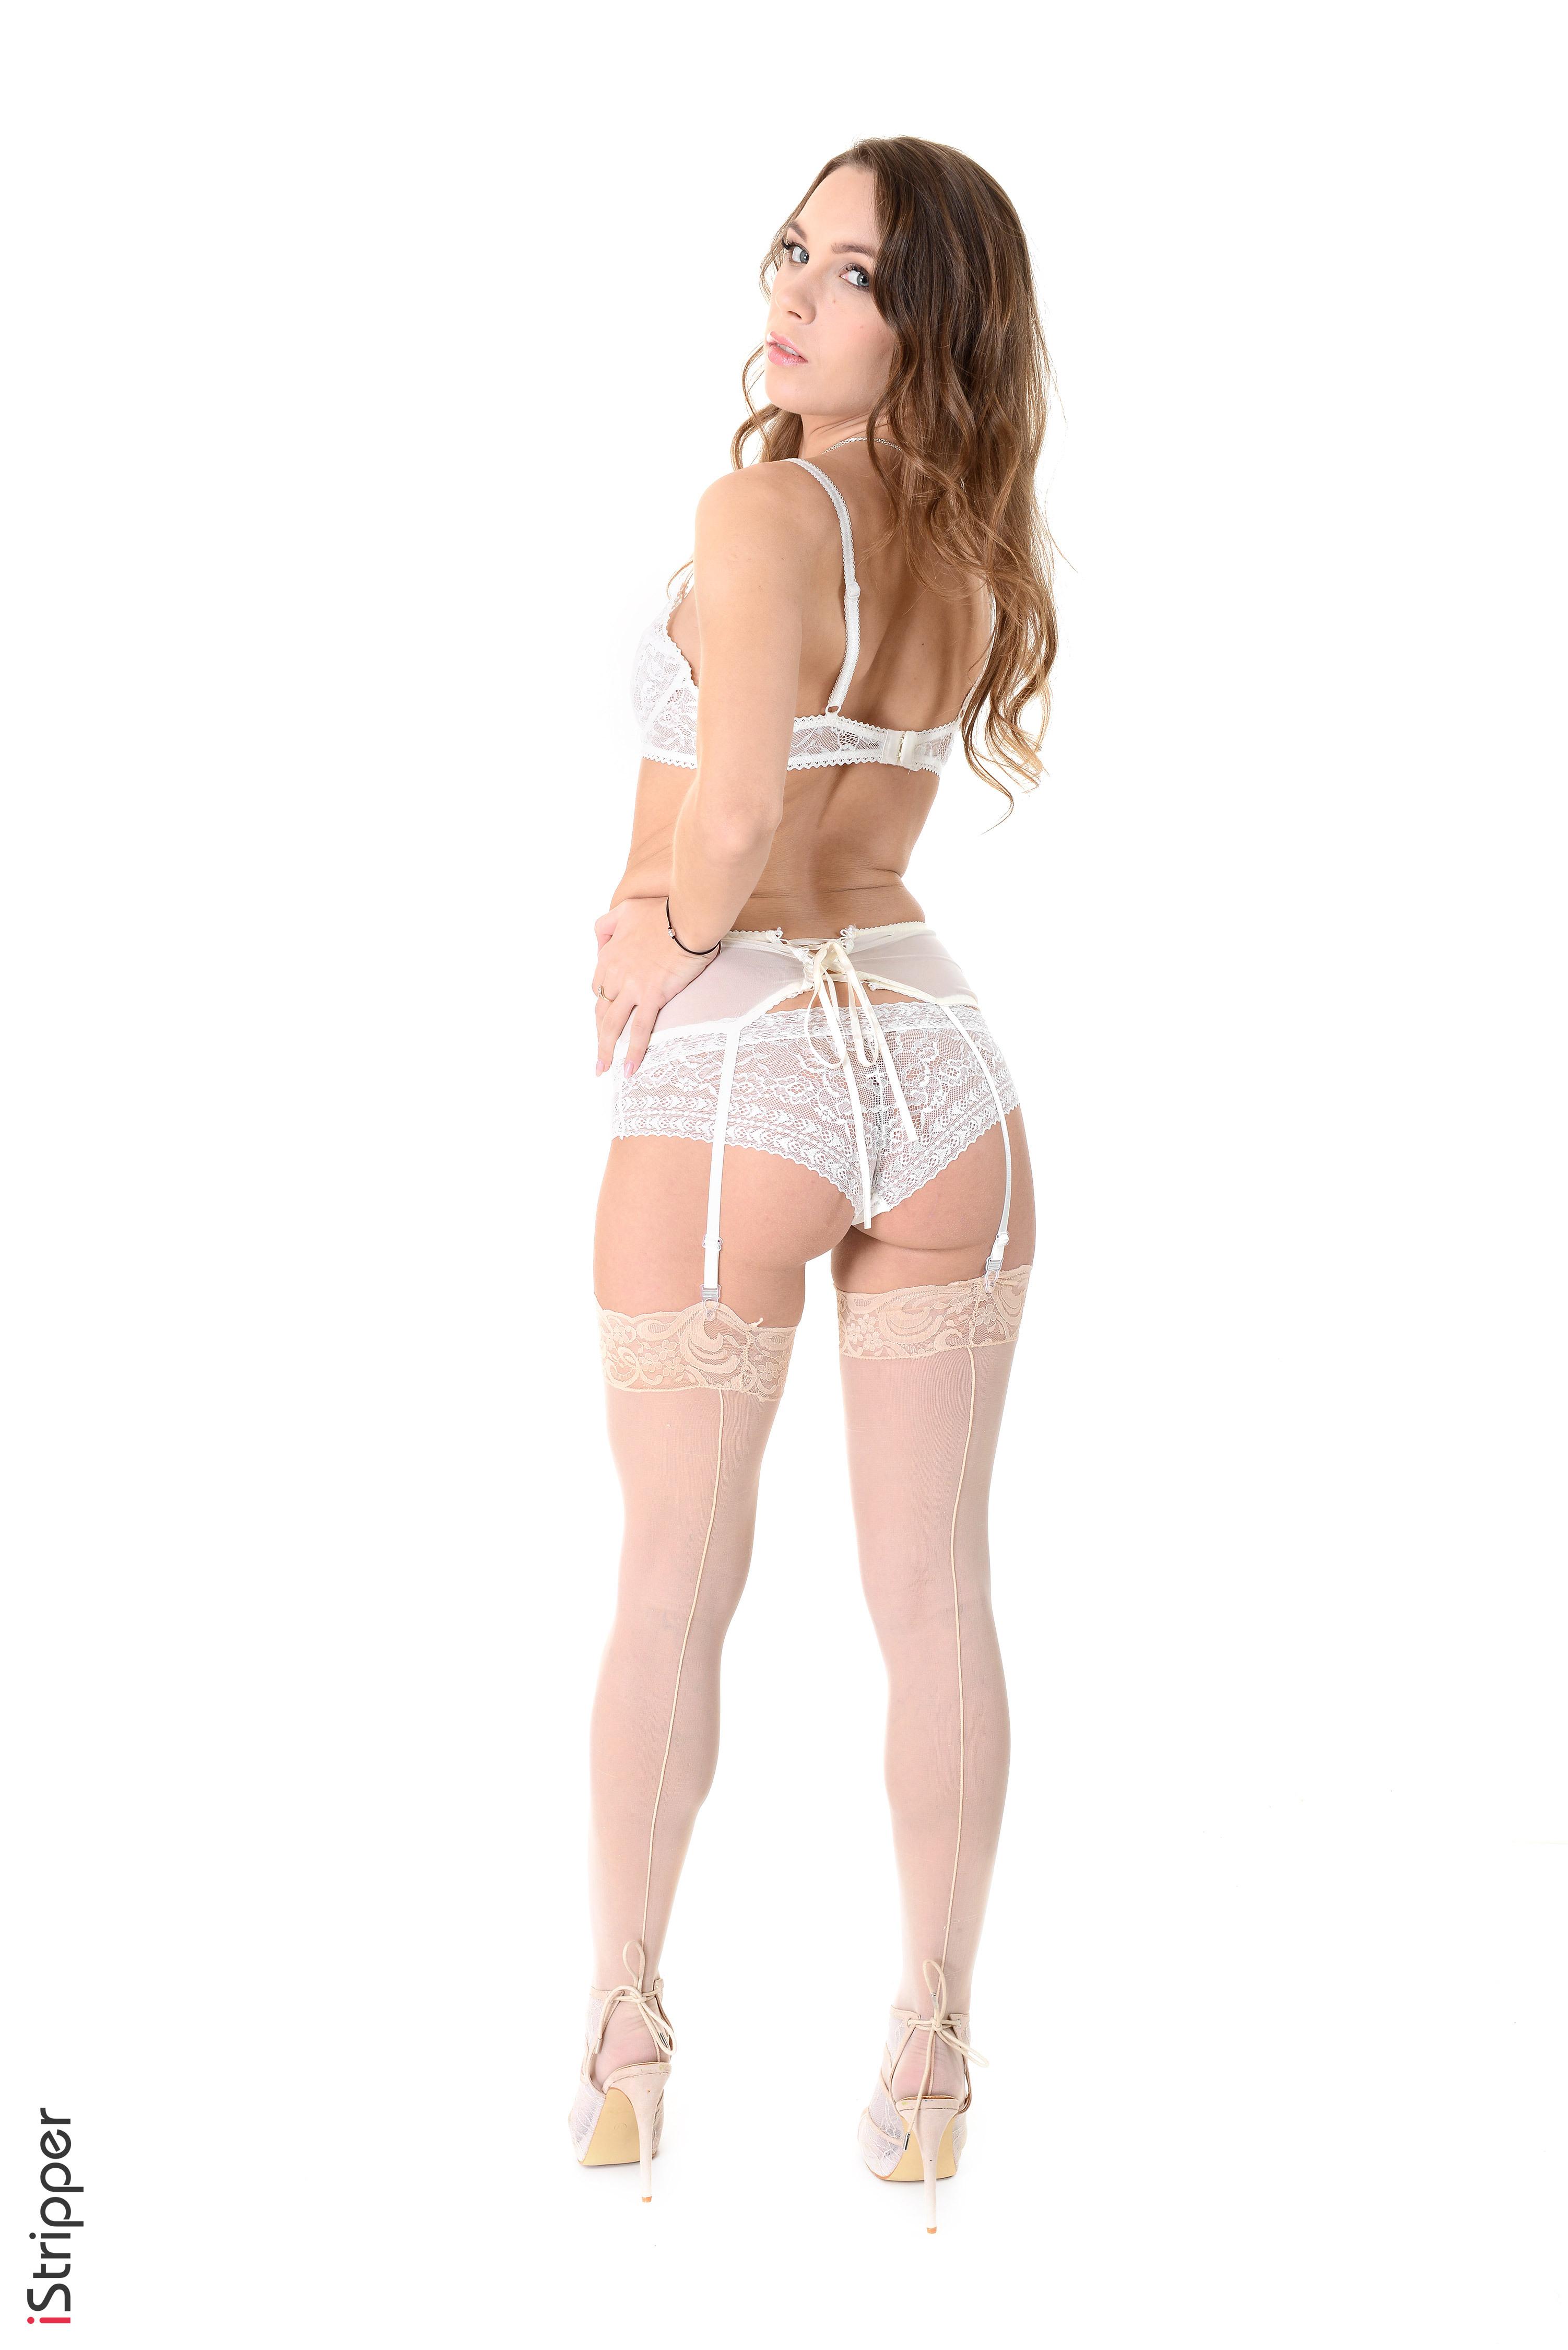 solo girls stripping